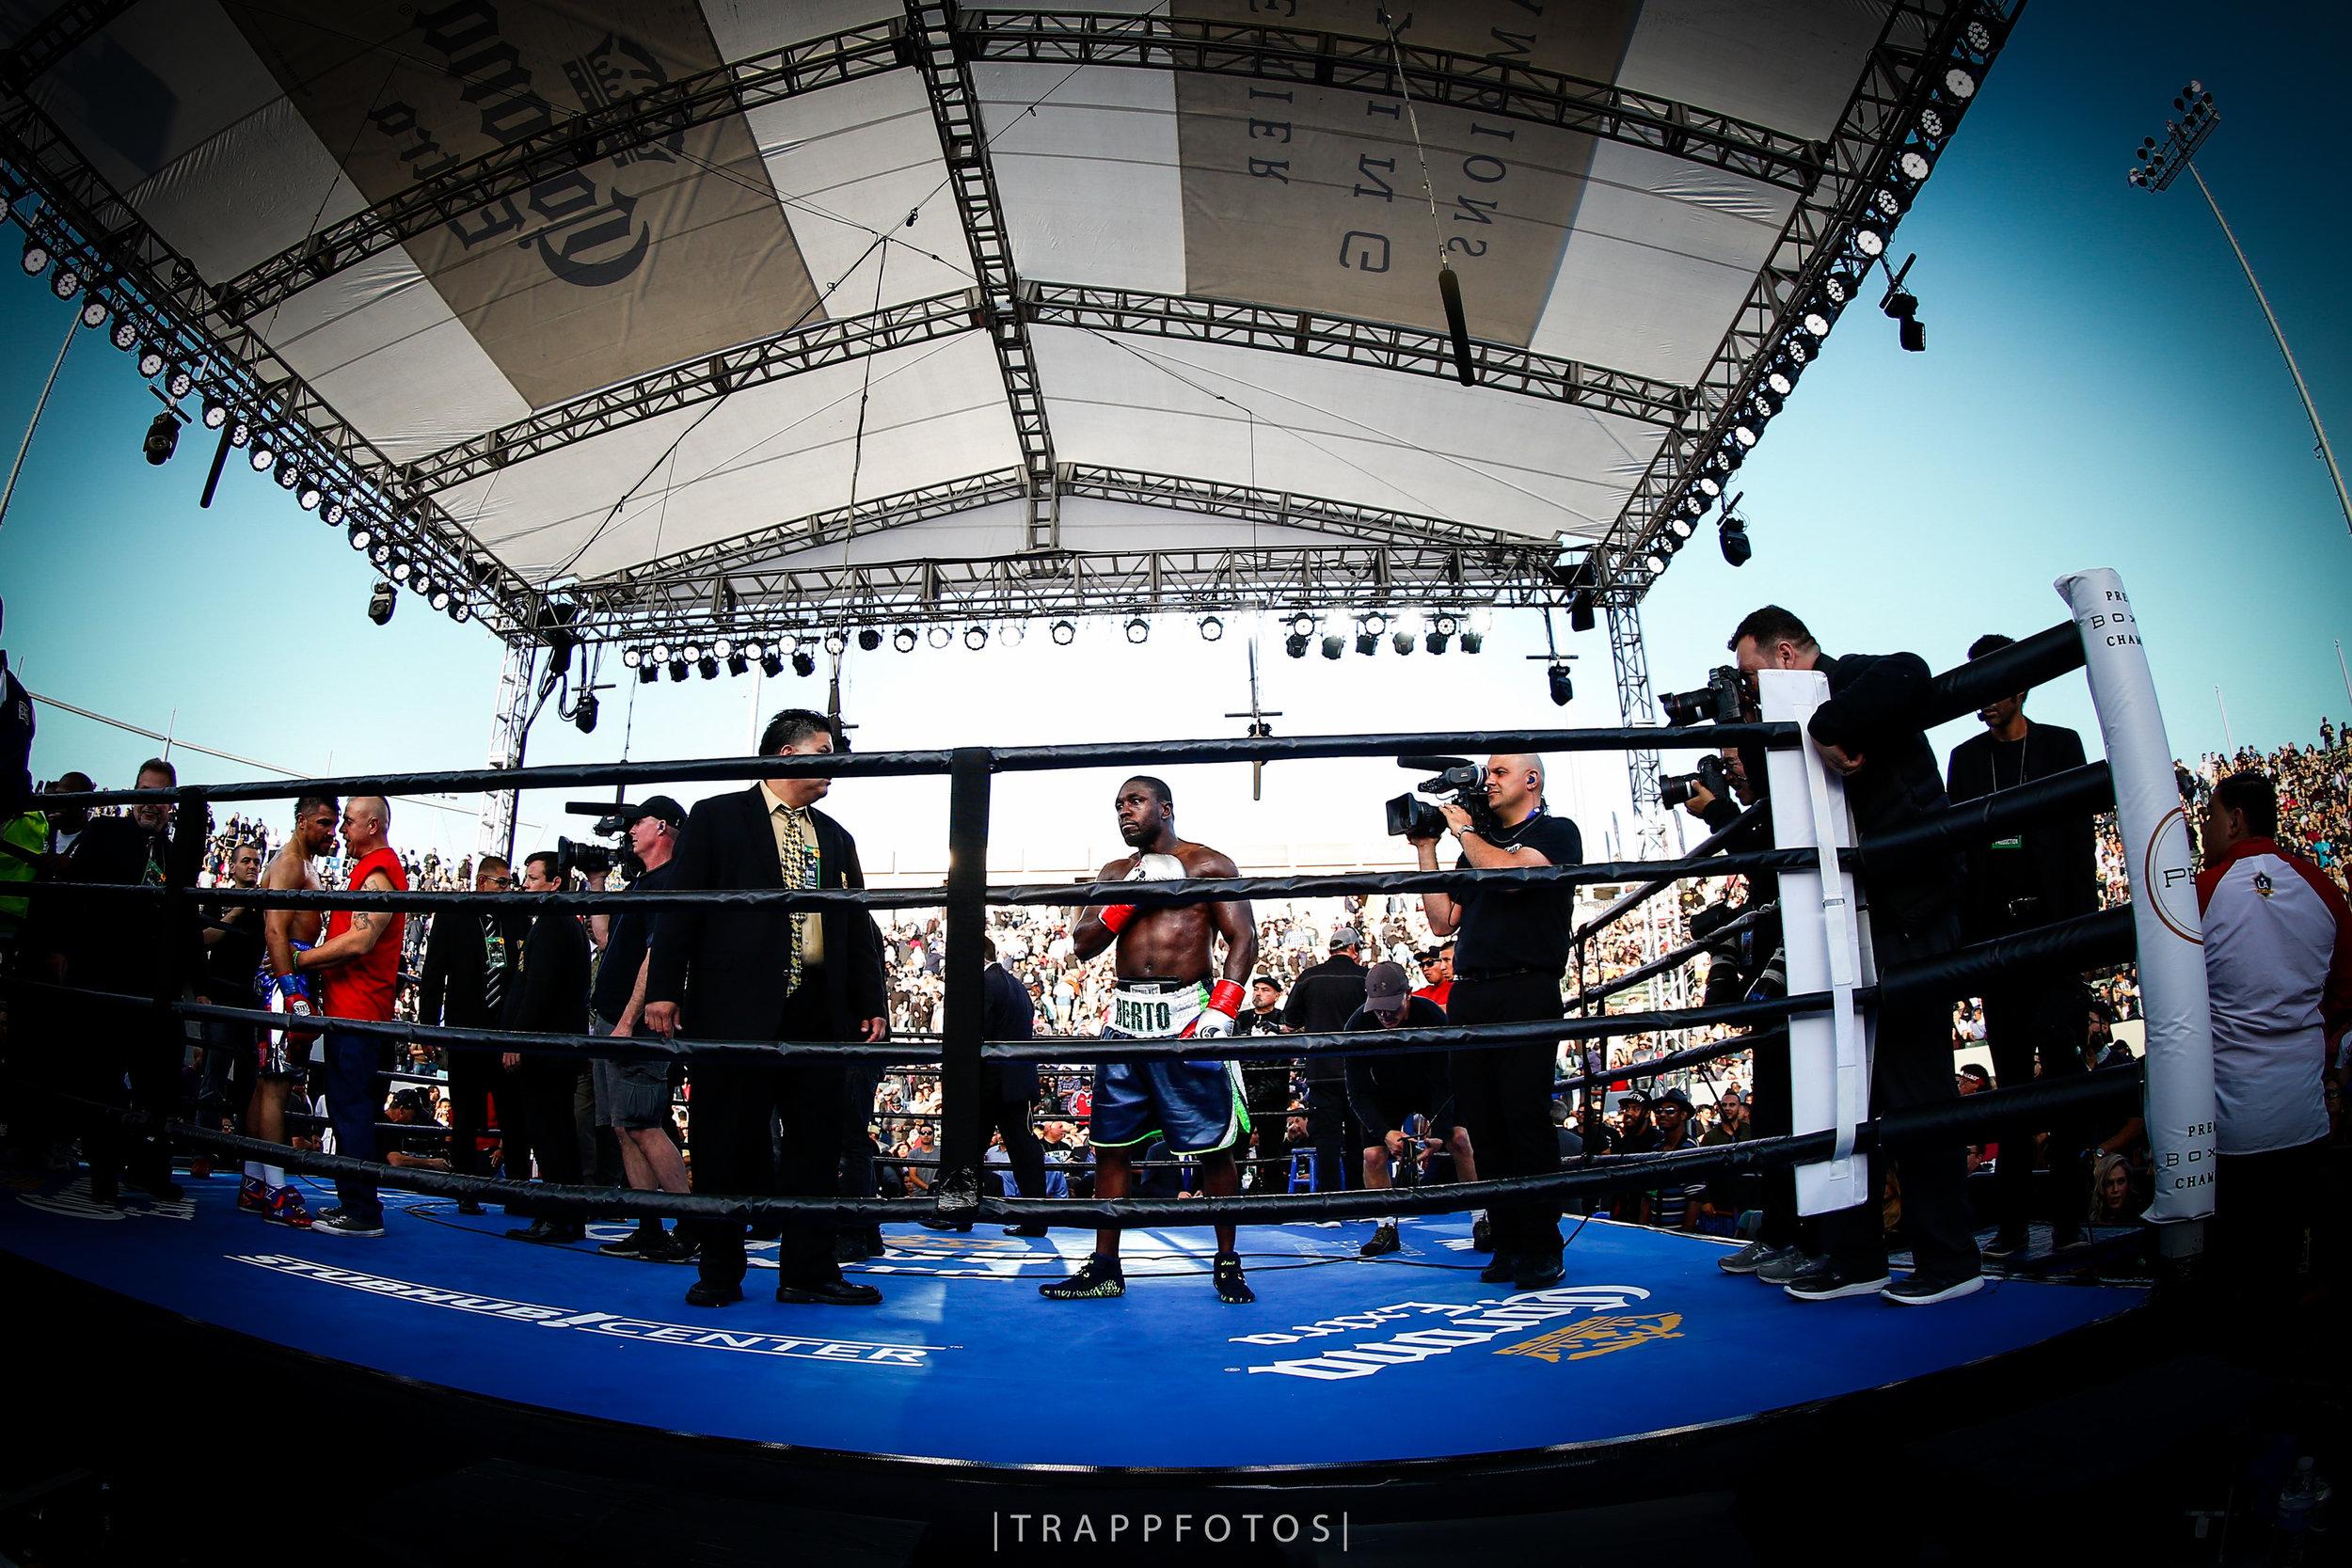 LR_BERTO VS ORTIZ-FIGHT WEEK-TRAPPFOTOS-04302016-8948.jpg